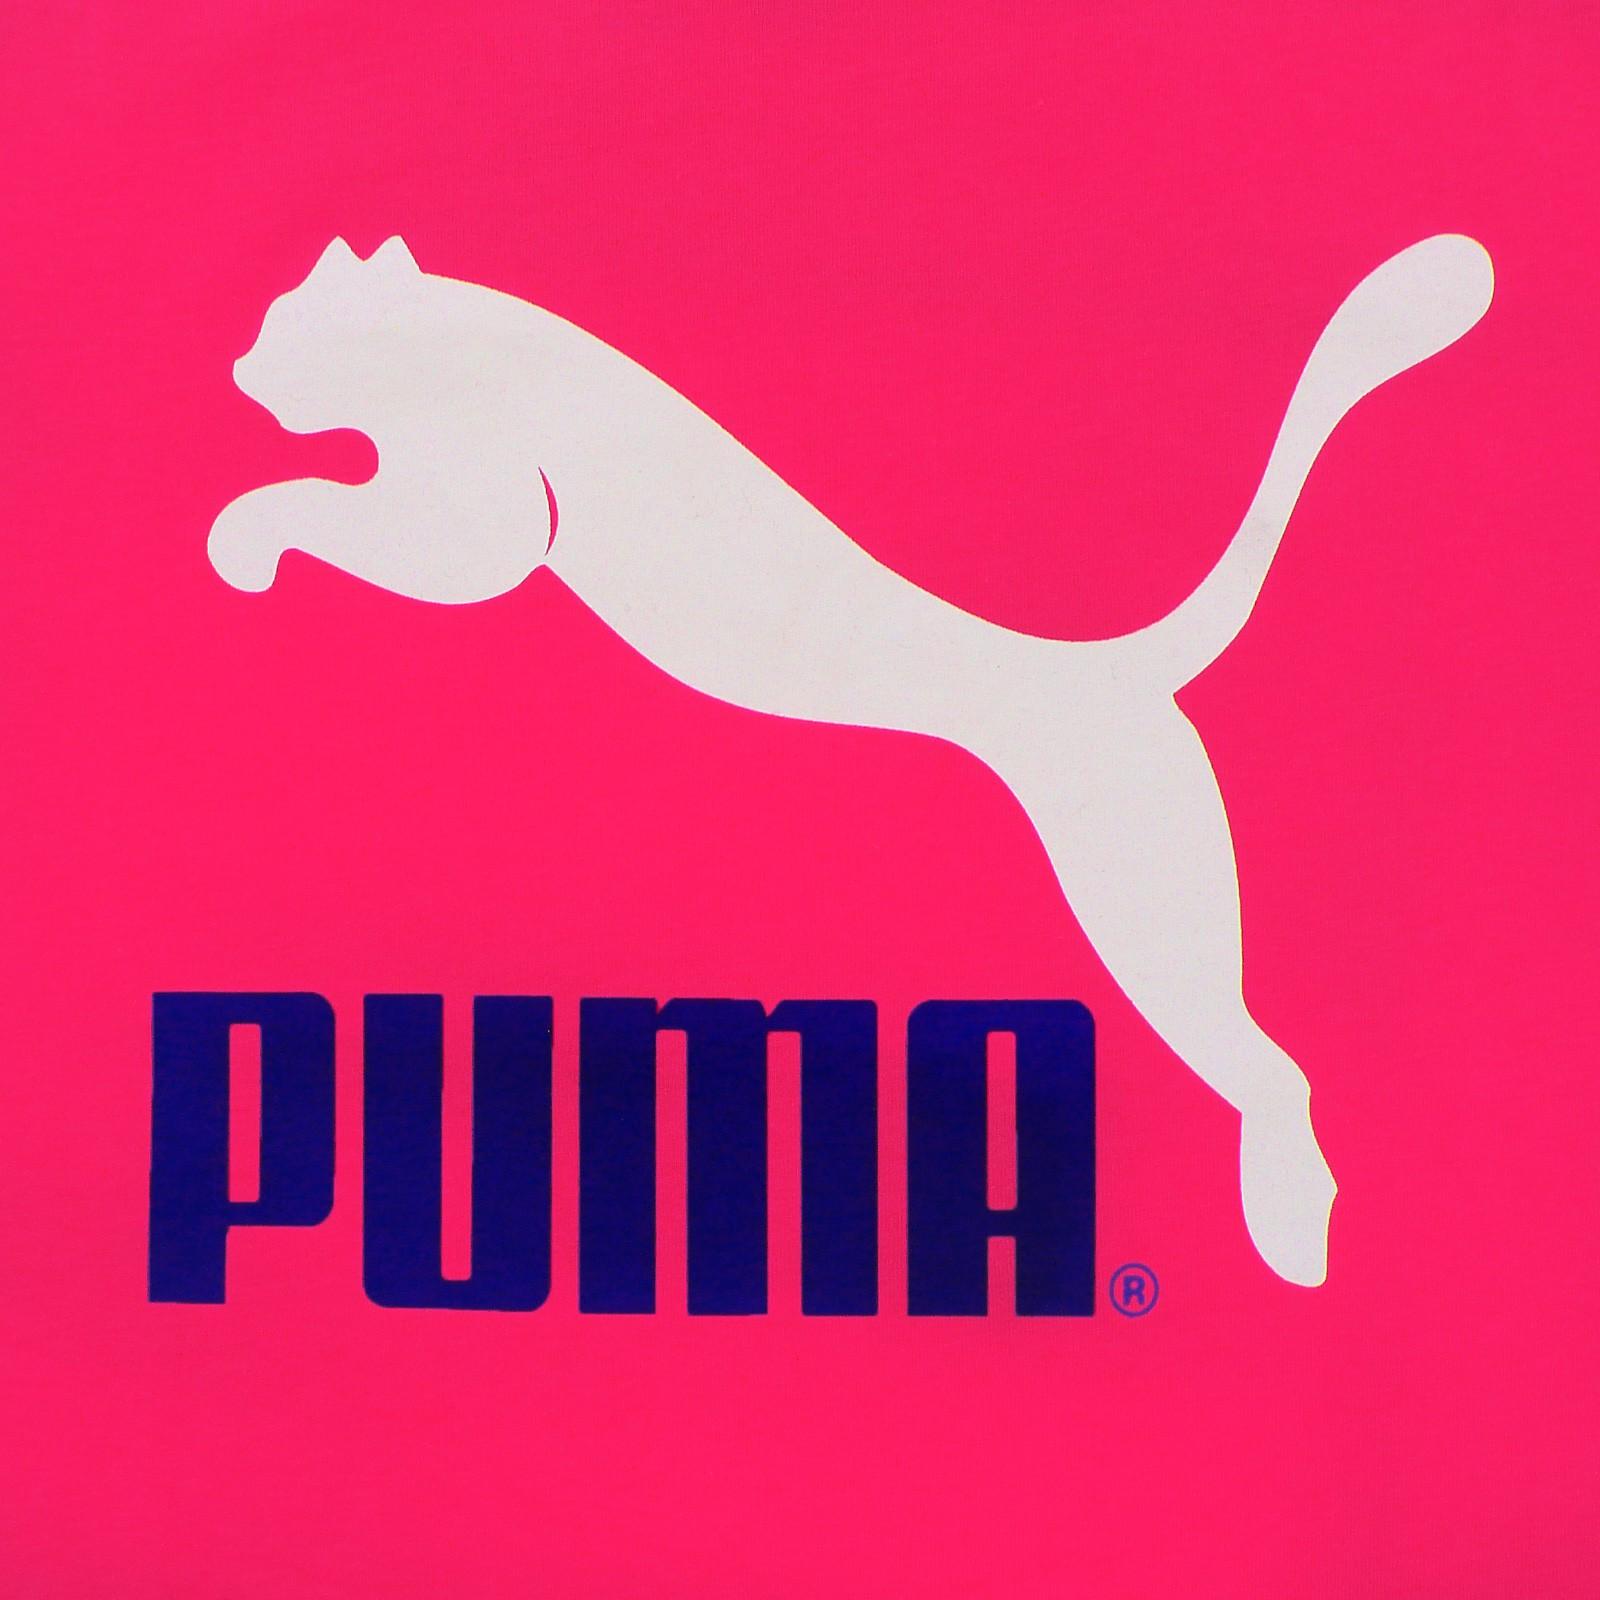 Puma originals large logo no 1 t shirt men 39 s t shirt pink leisure sports s xxl ebay - Puma logo pictures ...